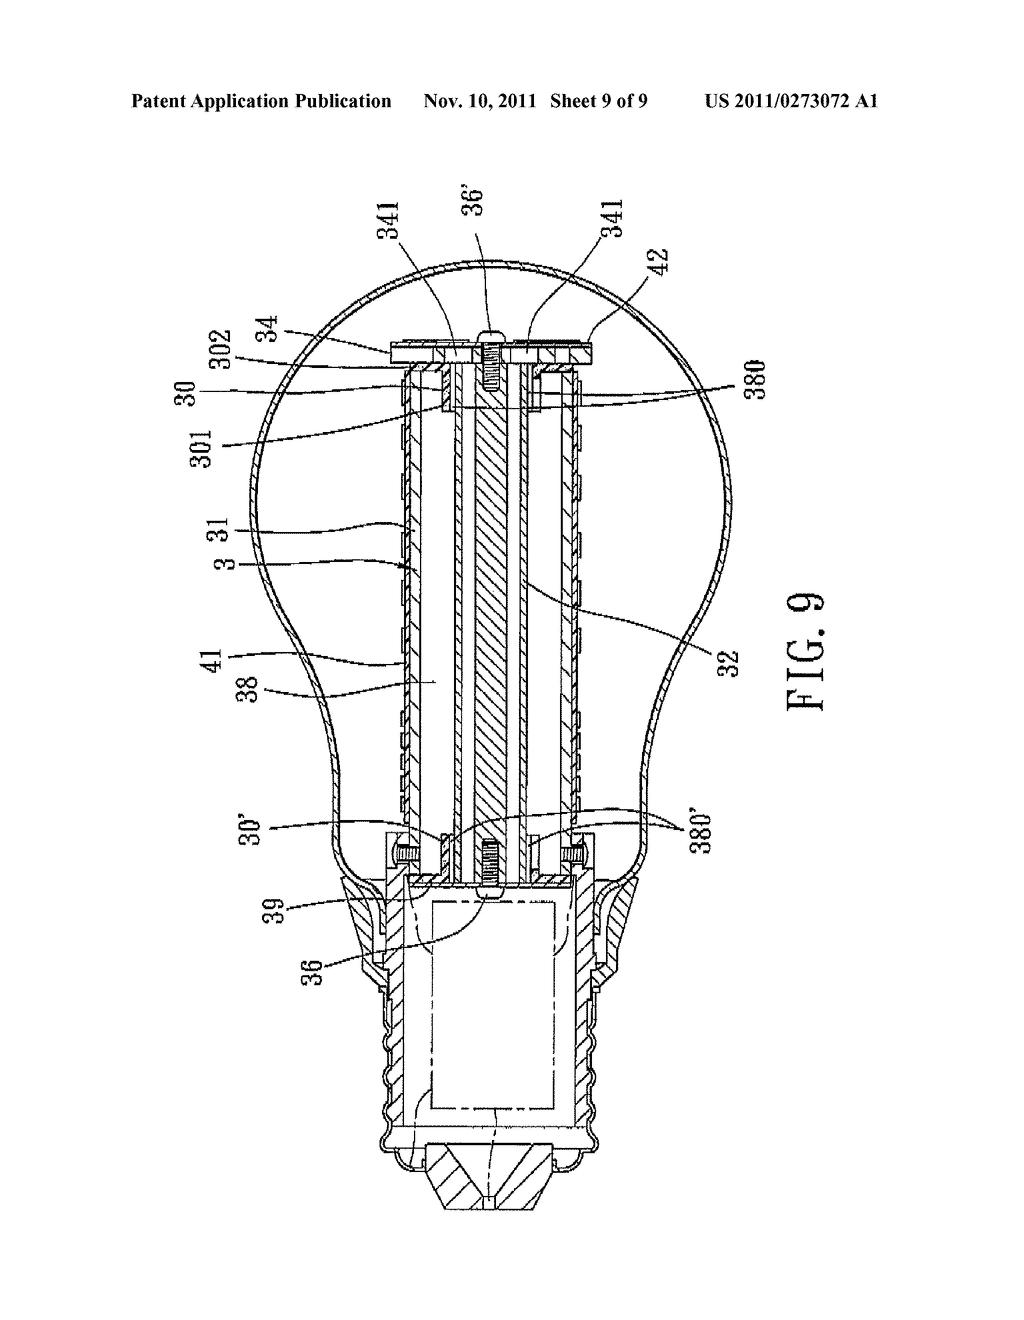 hight resolution of light bulb diagram schematic and image 10 simple light bulb schematic light bulb schematic